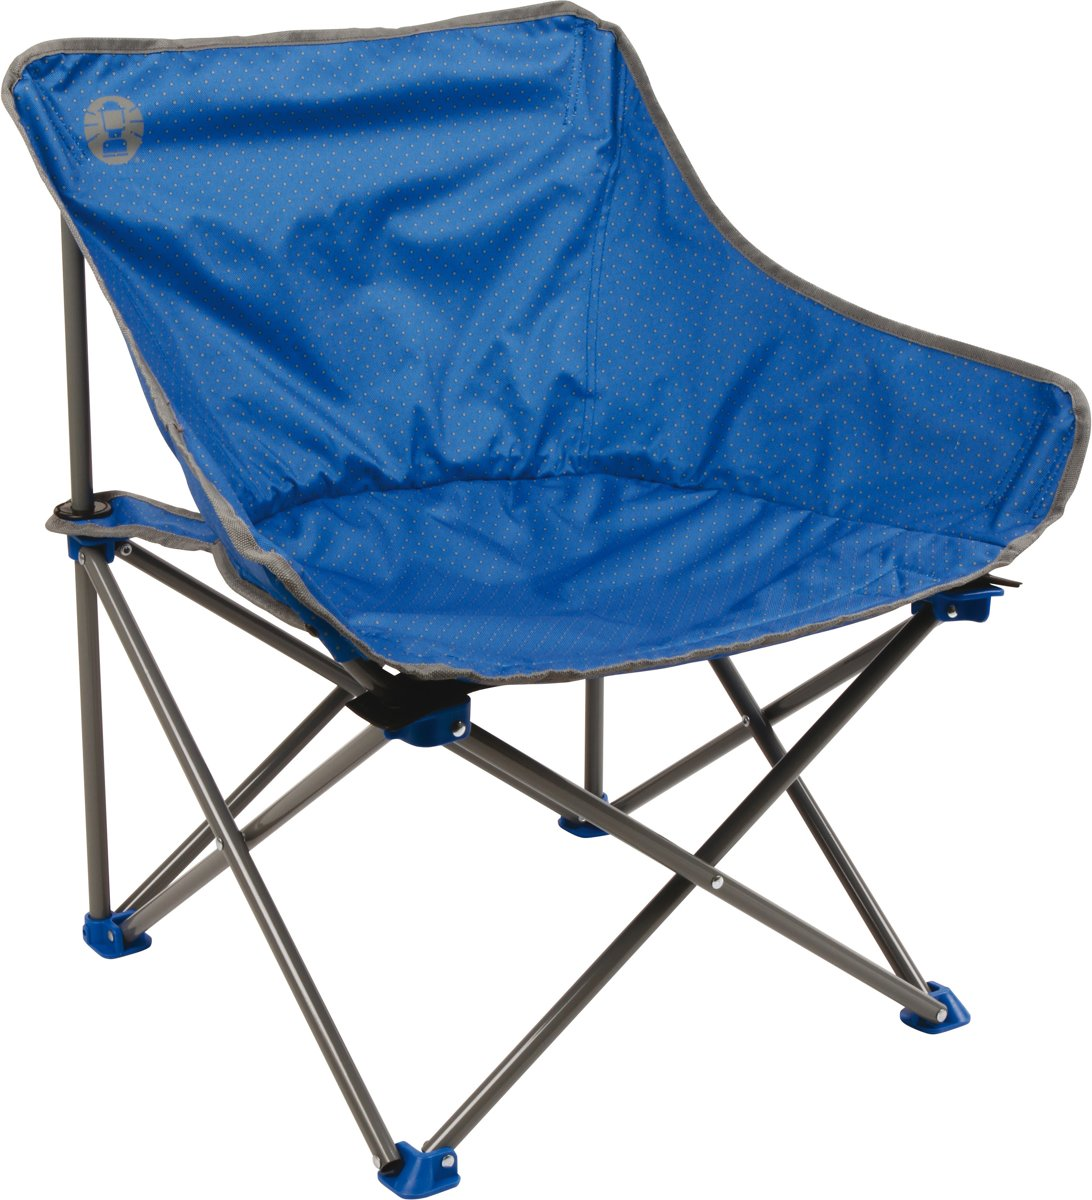 Coleman campingstoel kick-back blauw